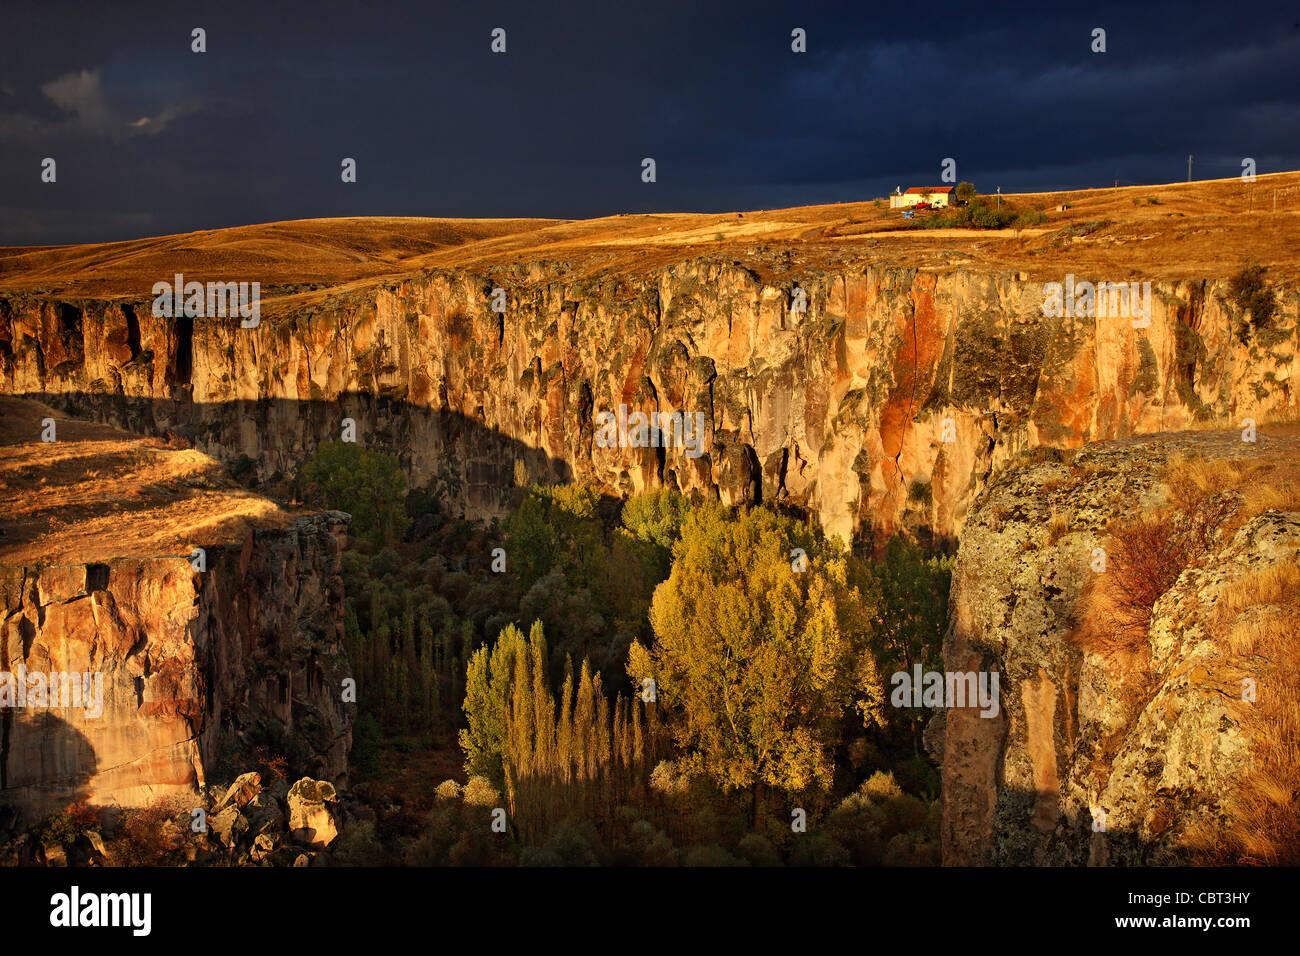 Kappadokien, Aksaray, Türkei. Der Eingang des Ihlara Tal unter schweren, bewölkt sk Stockbild